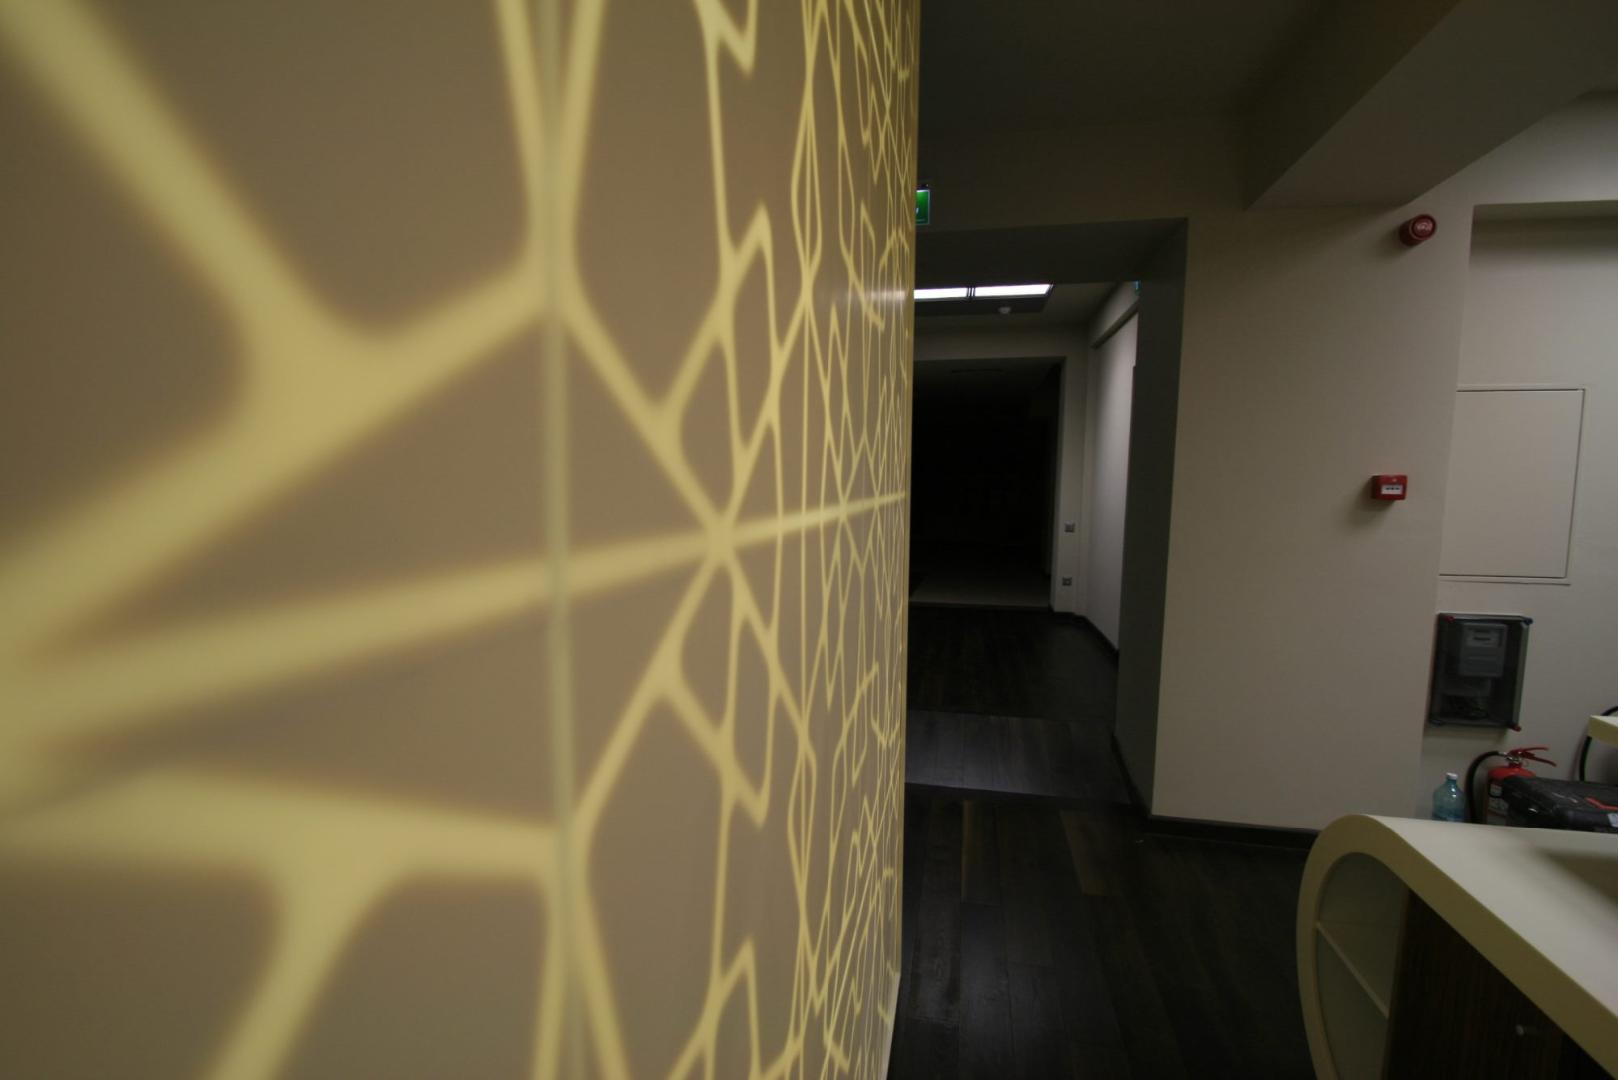 placari pereti corian iluminat led receptie corian termoformat furnir tavan furnir nuc tridimensional mobilier trafoare atipic depa001